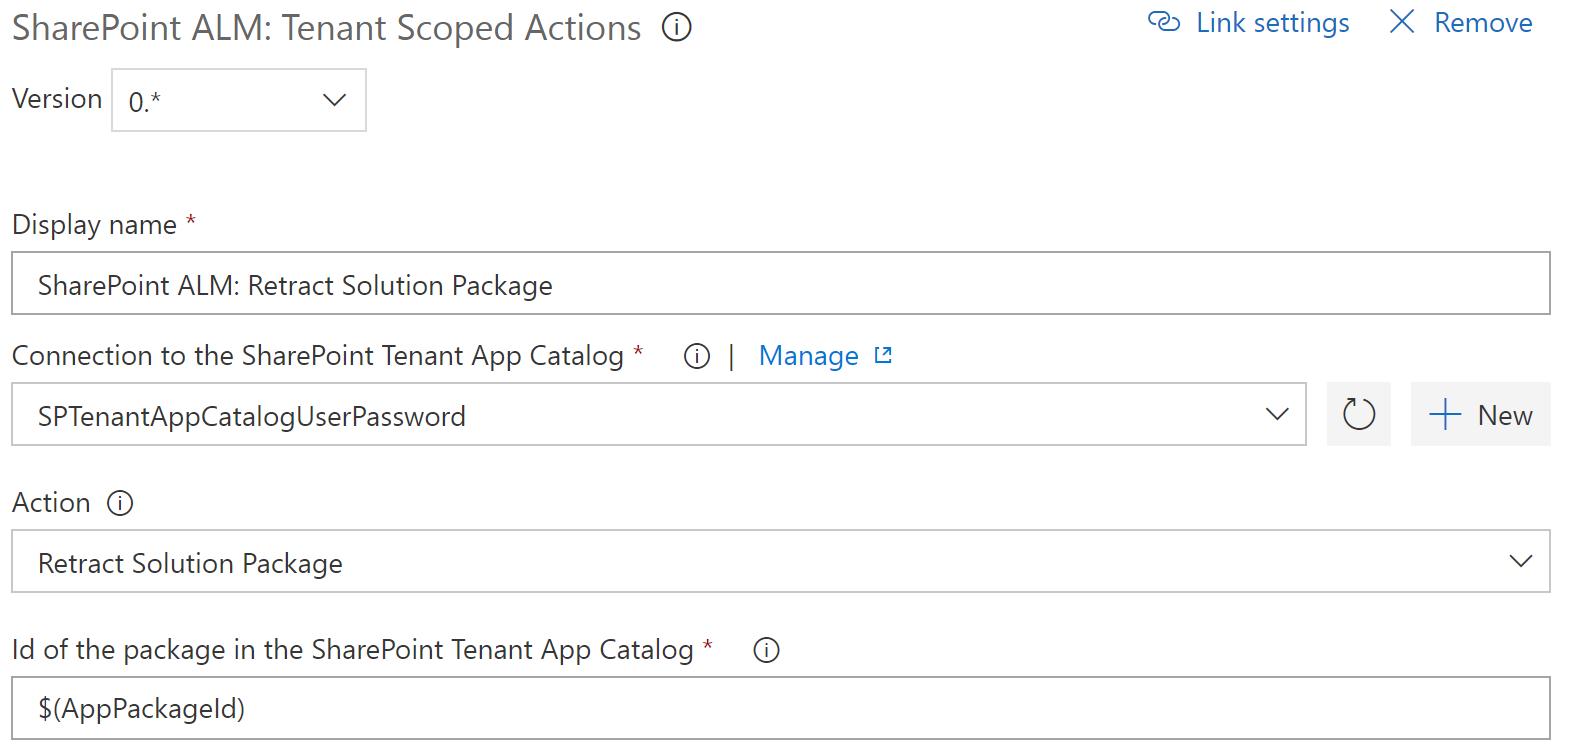 Catalog Scoped Action: Retract